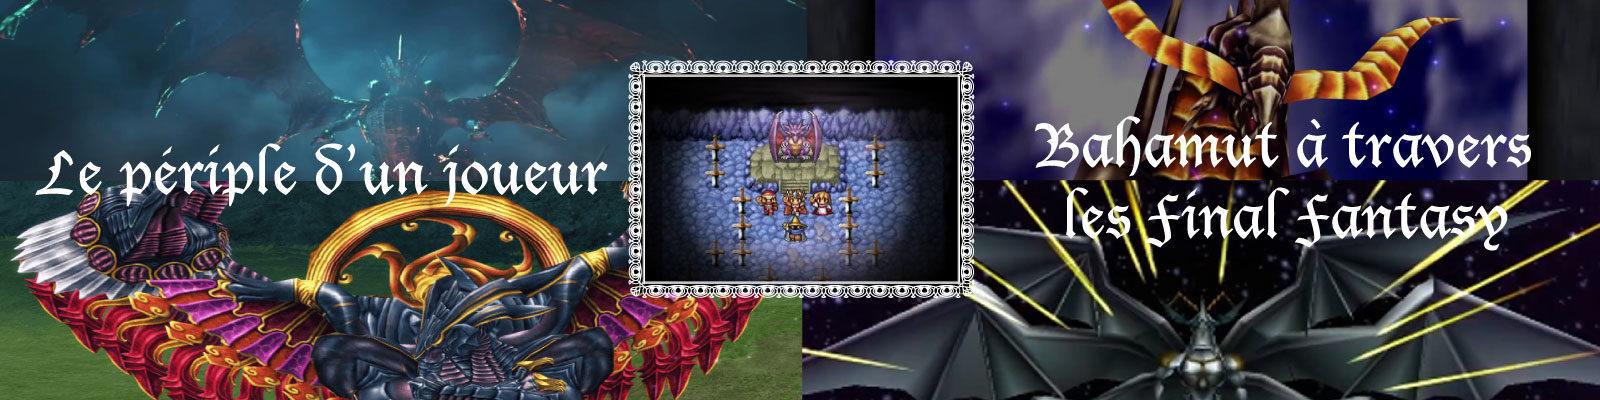 final-fantasy-vii-bahamut-zero